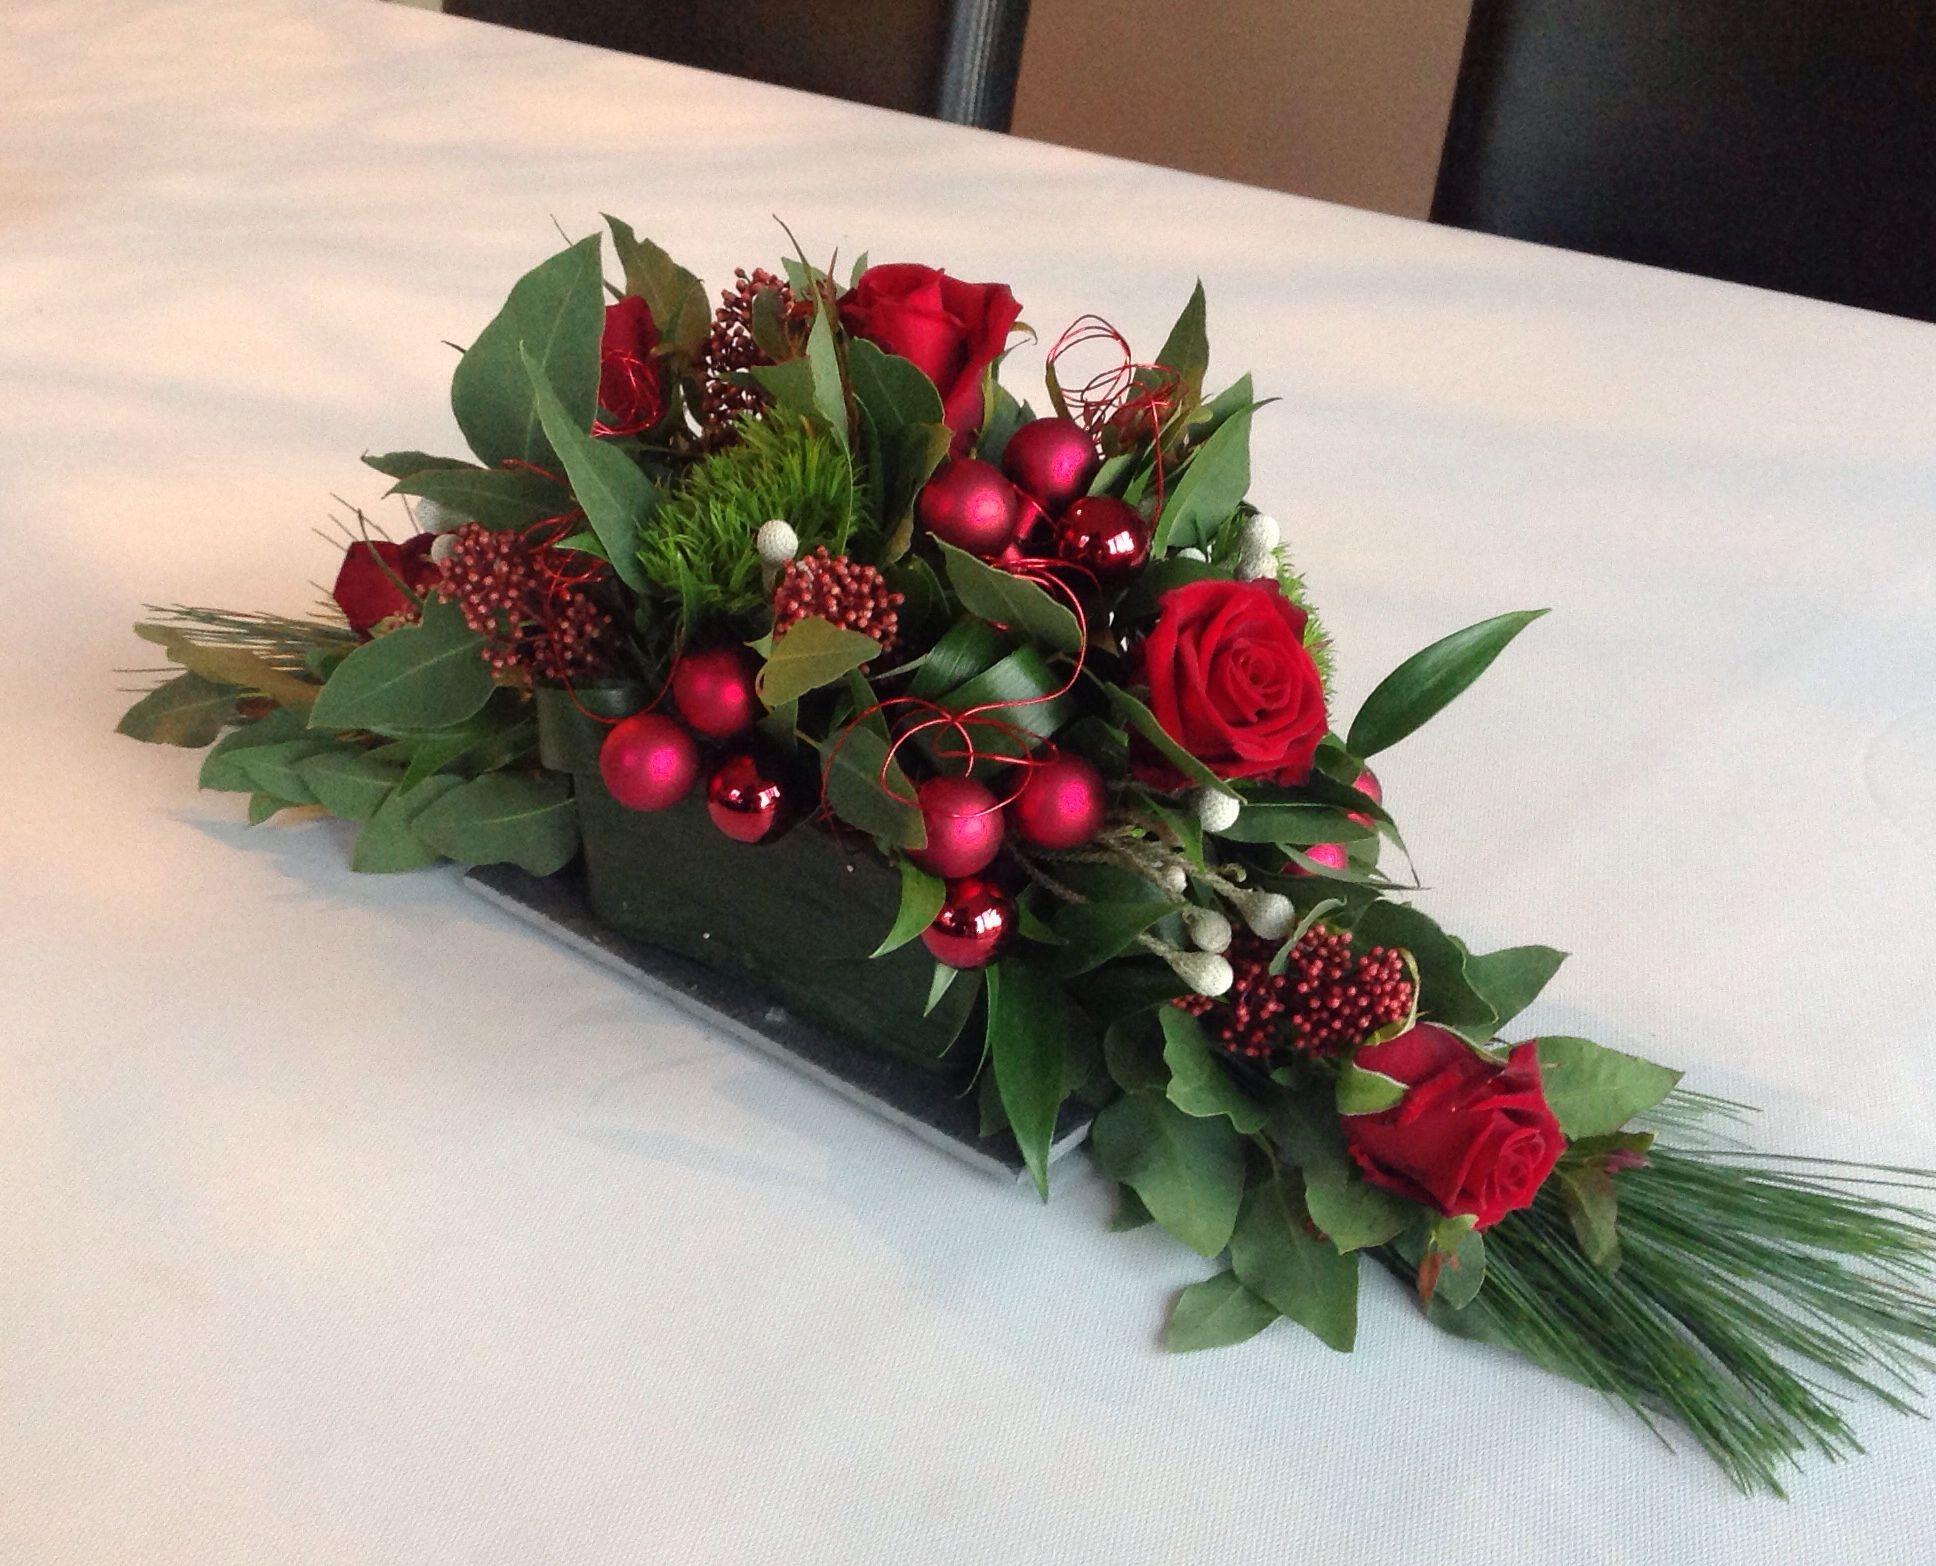 Wedding vase decorations november 2018 марія шеремет sheremetmaria on Pinterest